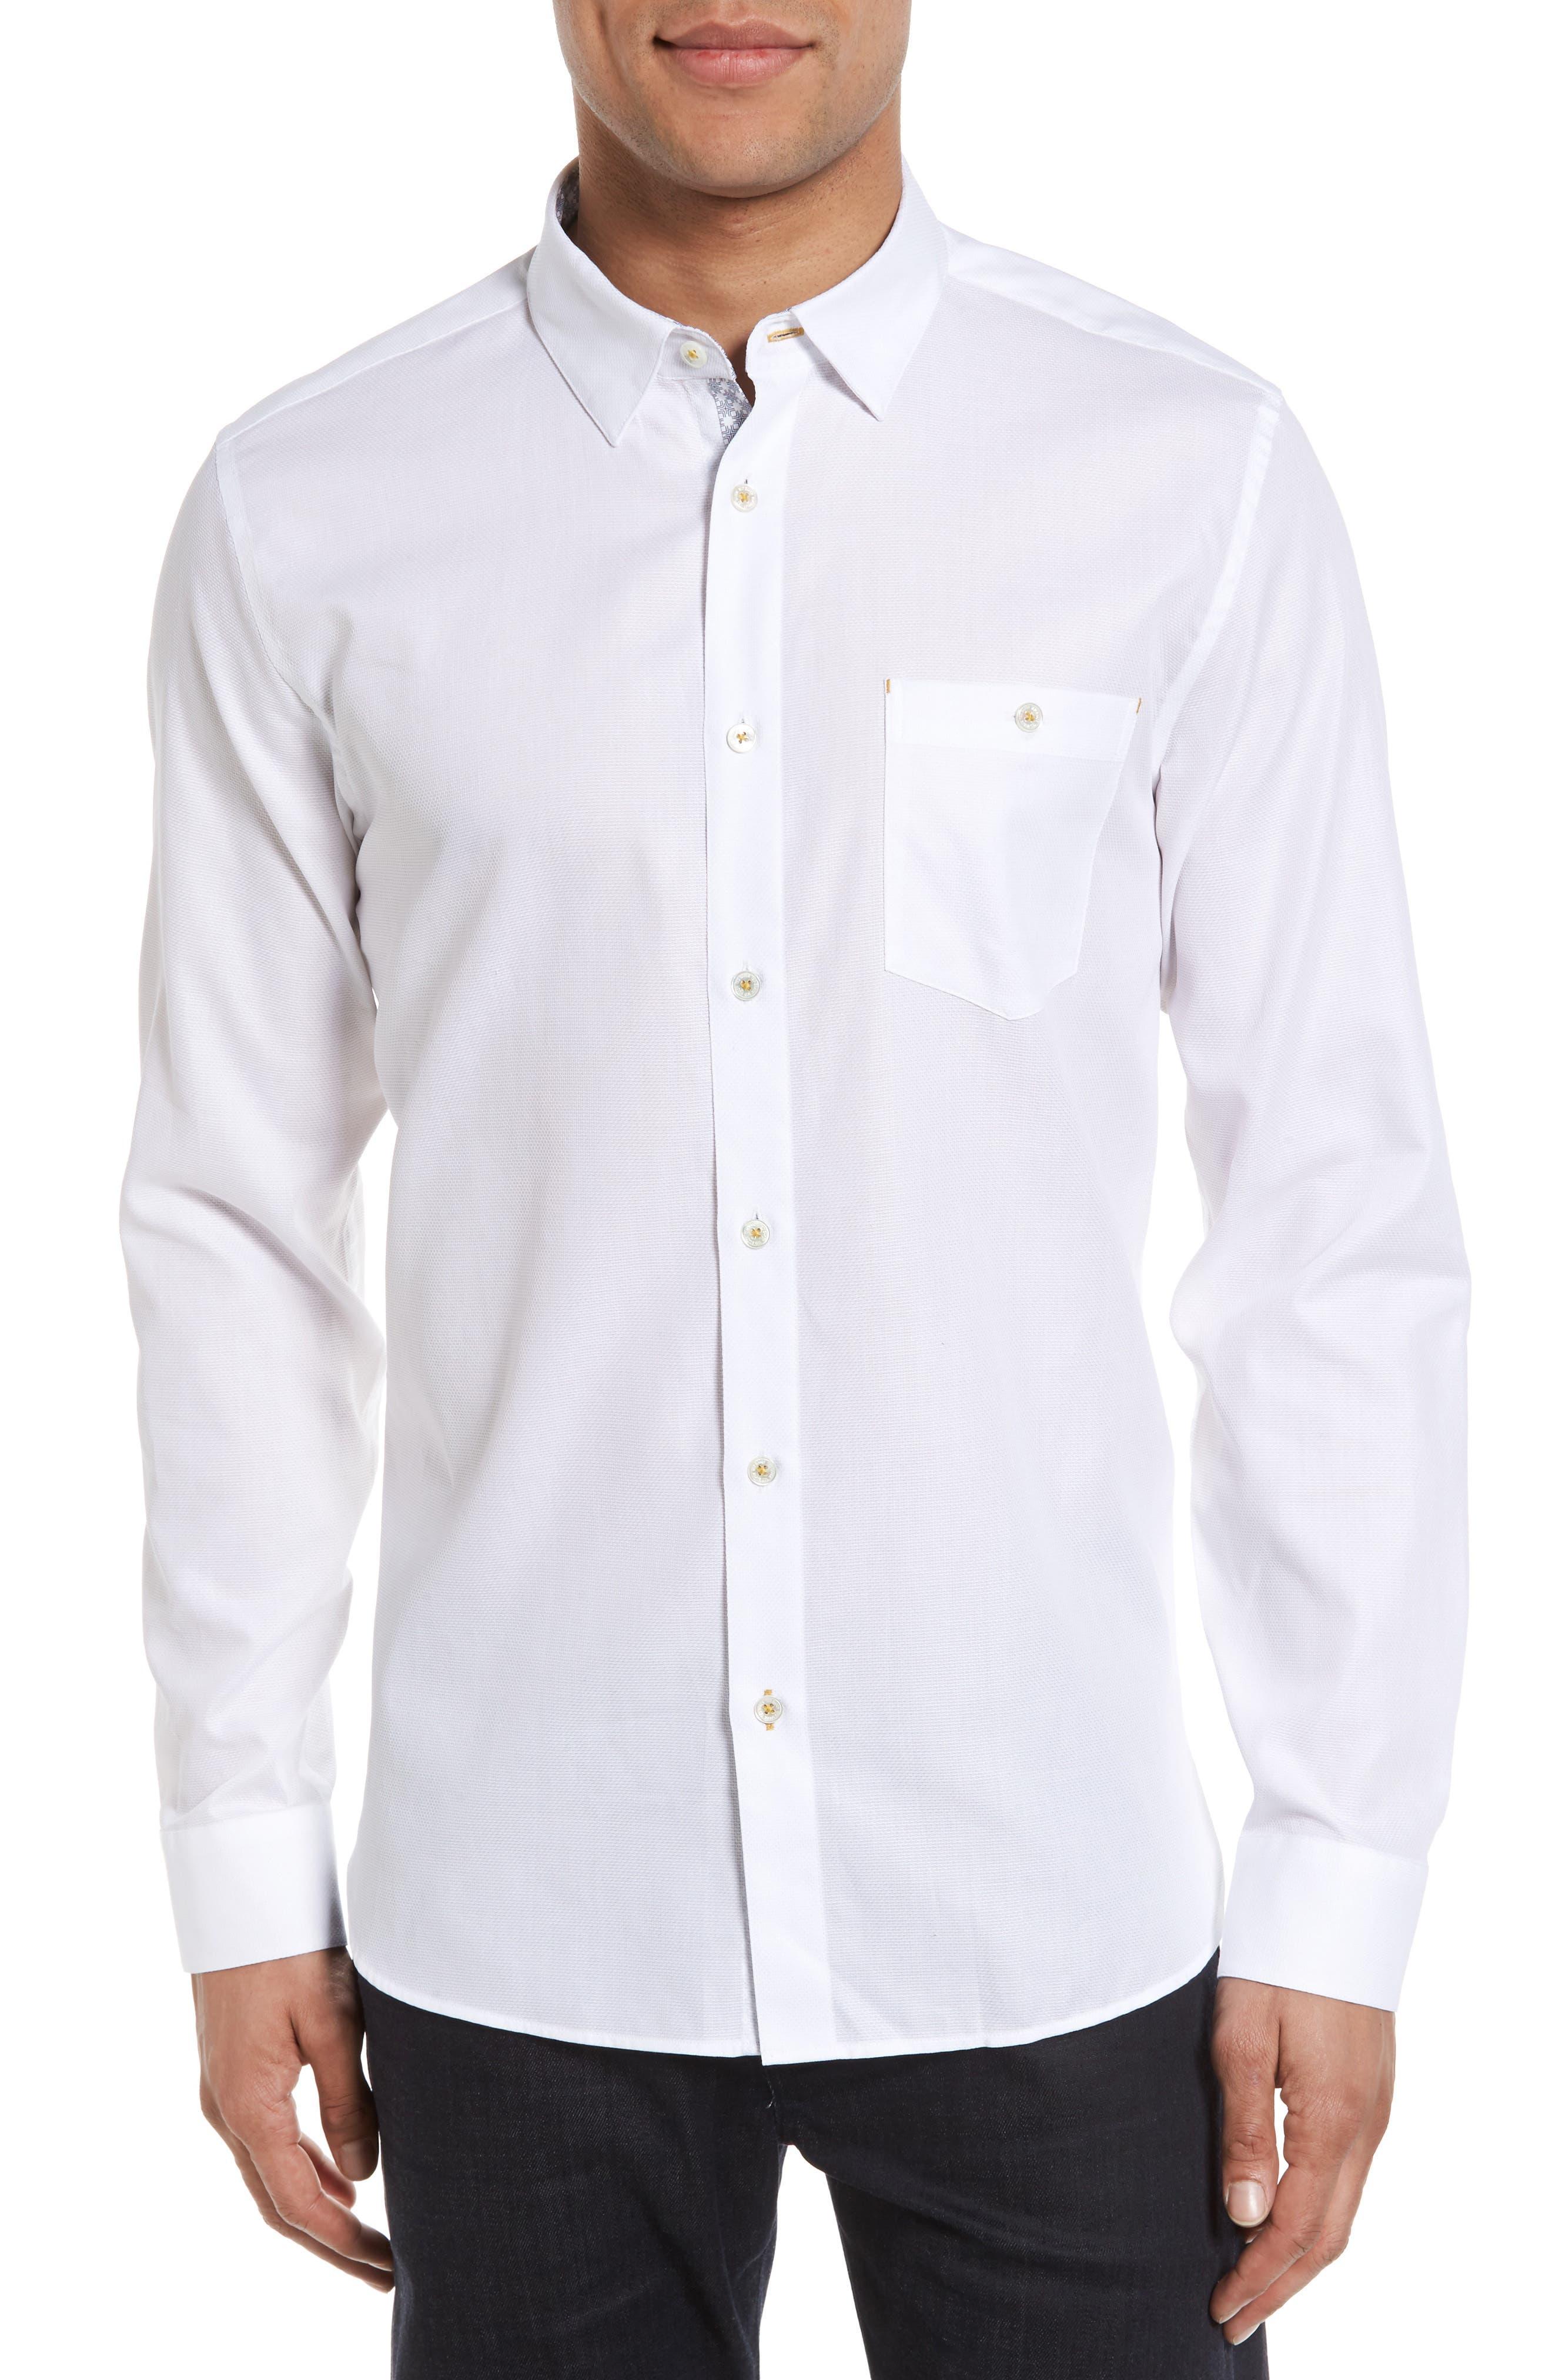 Alternate Image 1 Selected - Ted Baker London Nordlux Modern Slim Fit Stretch Cotton Sport Shirt